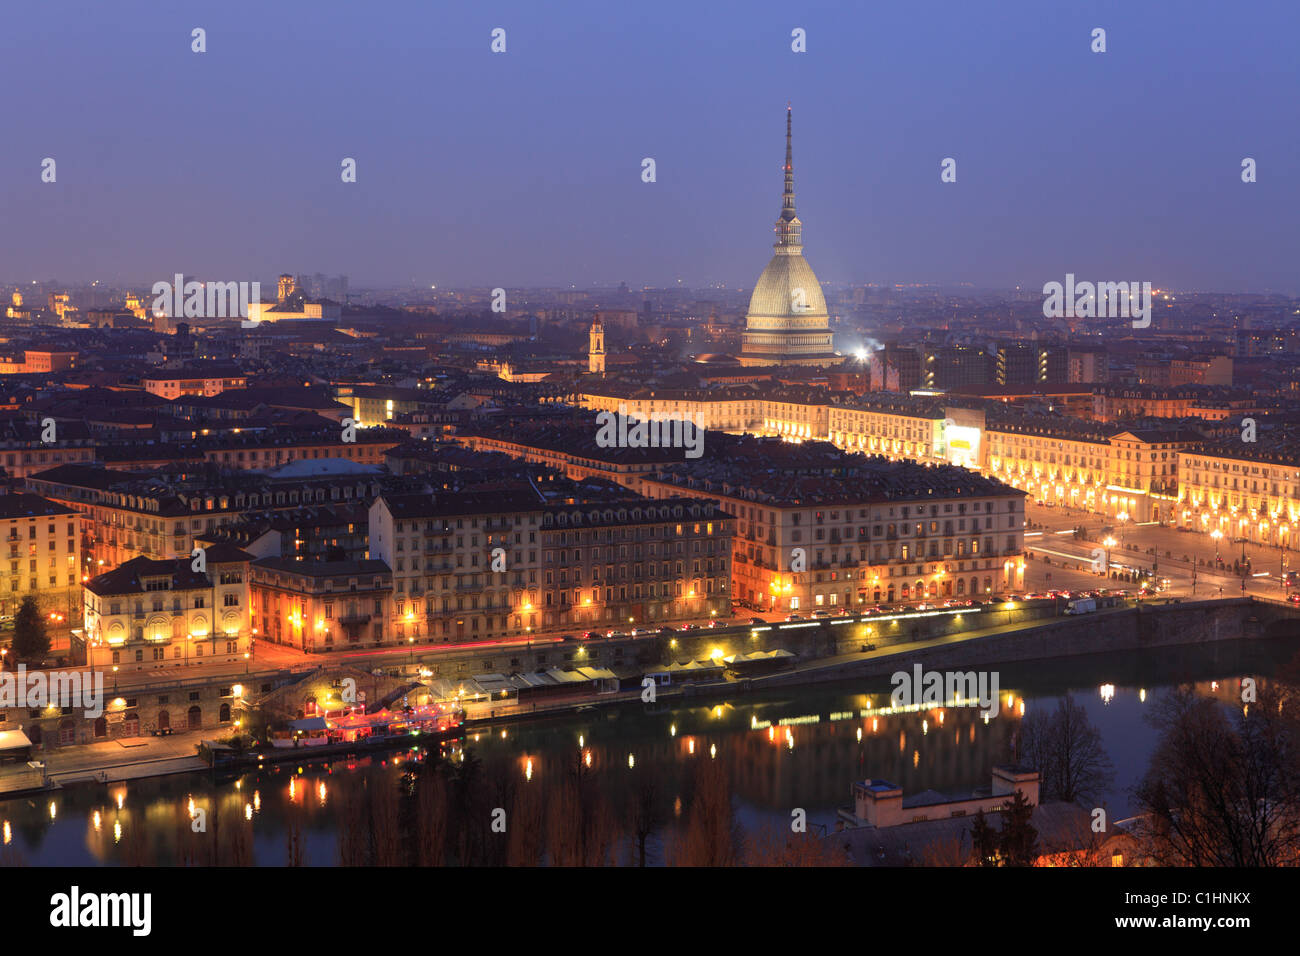 The Mole Antonelliana and cityscape, Turin, Italy - Stock Image